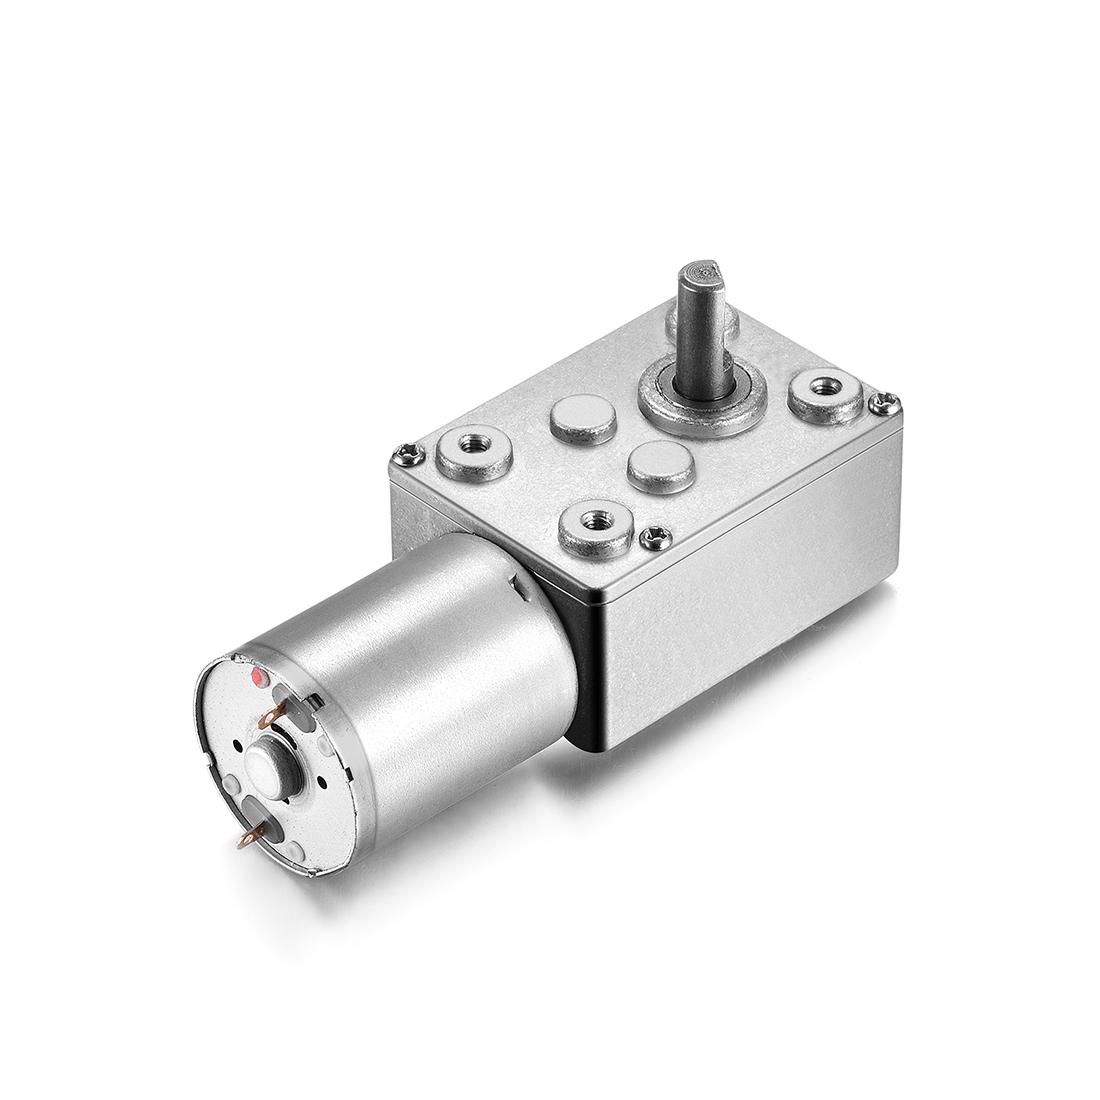 JSX69-370 DC 3V 70RPM 6mm Shaft High Torque Turbine Worm Gear Box Reduction Motor